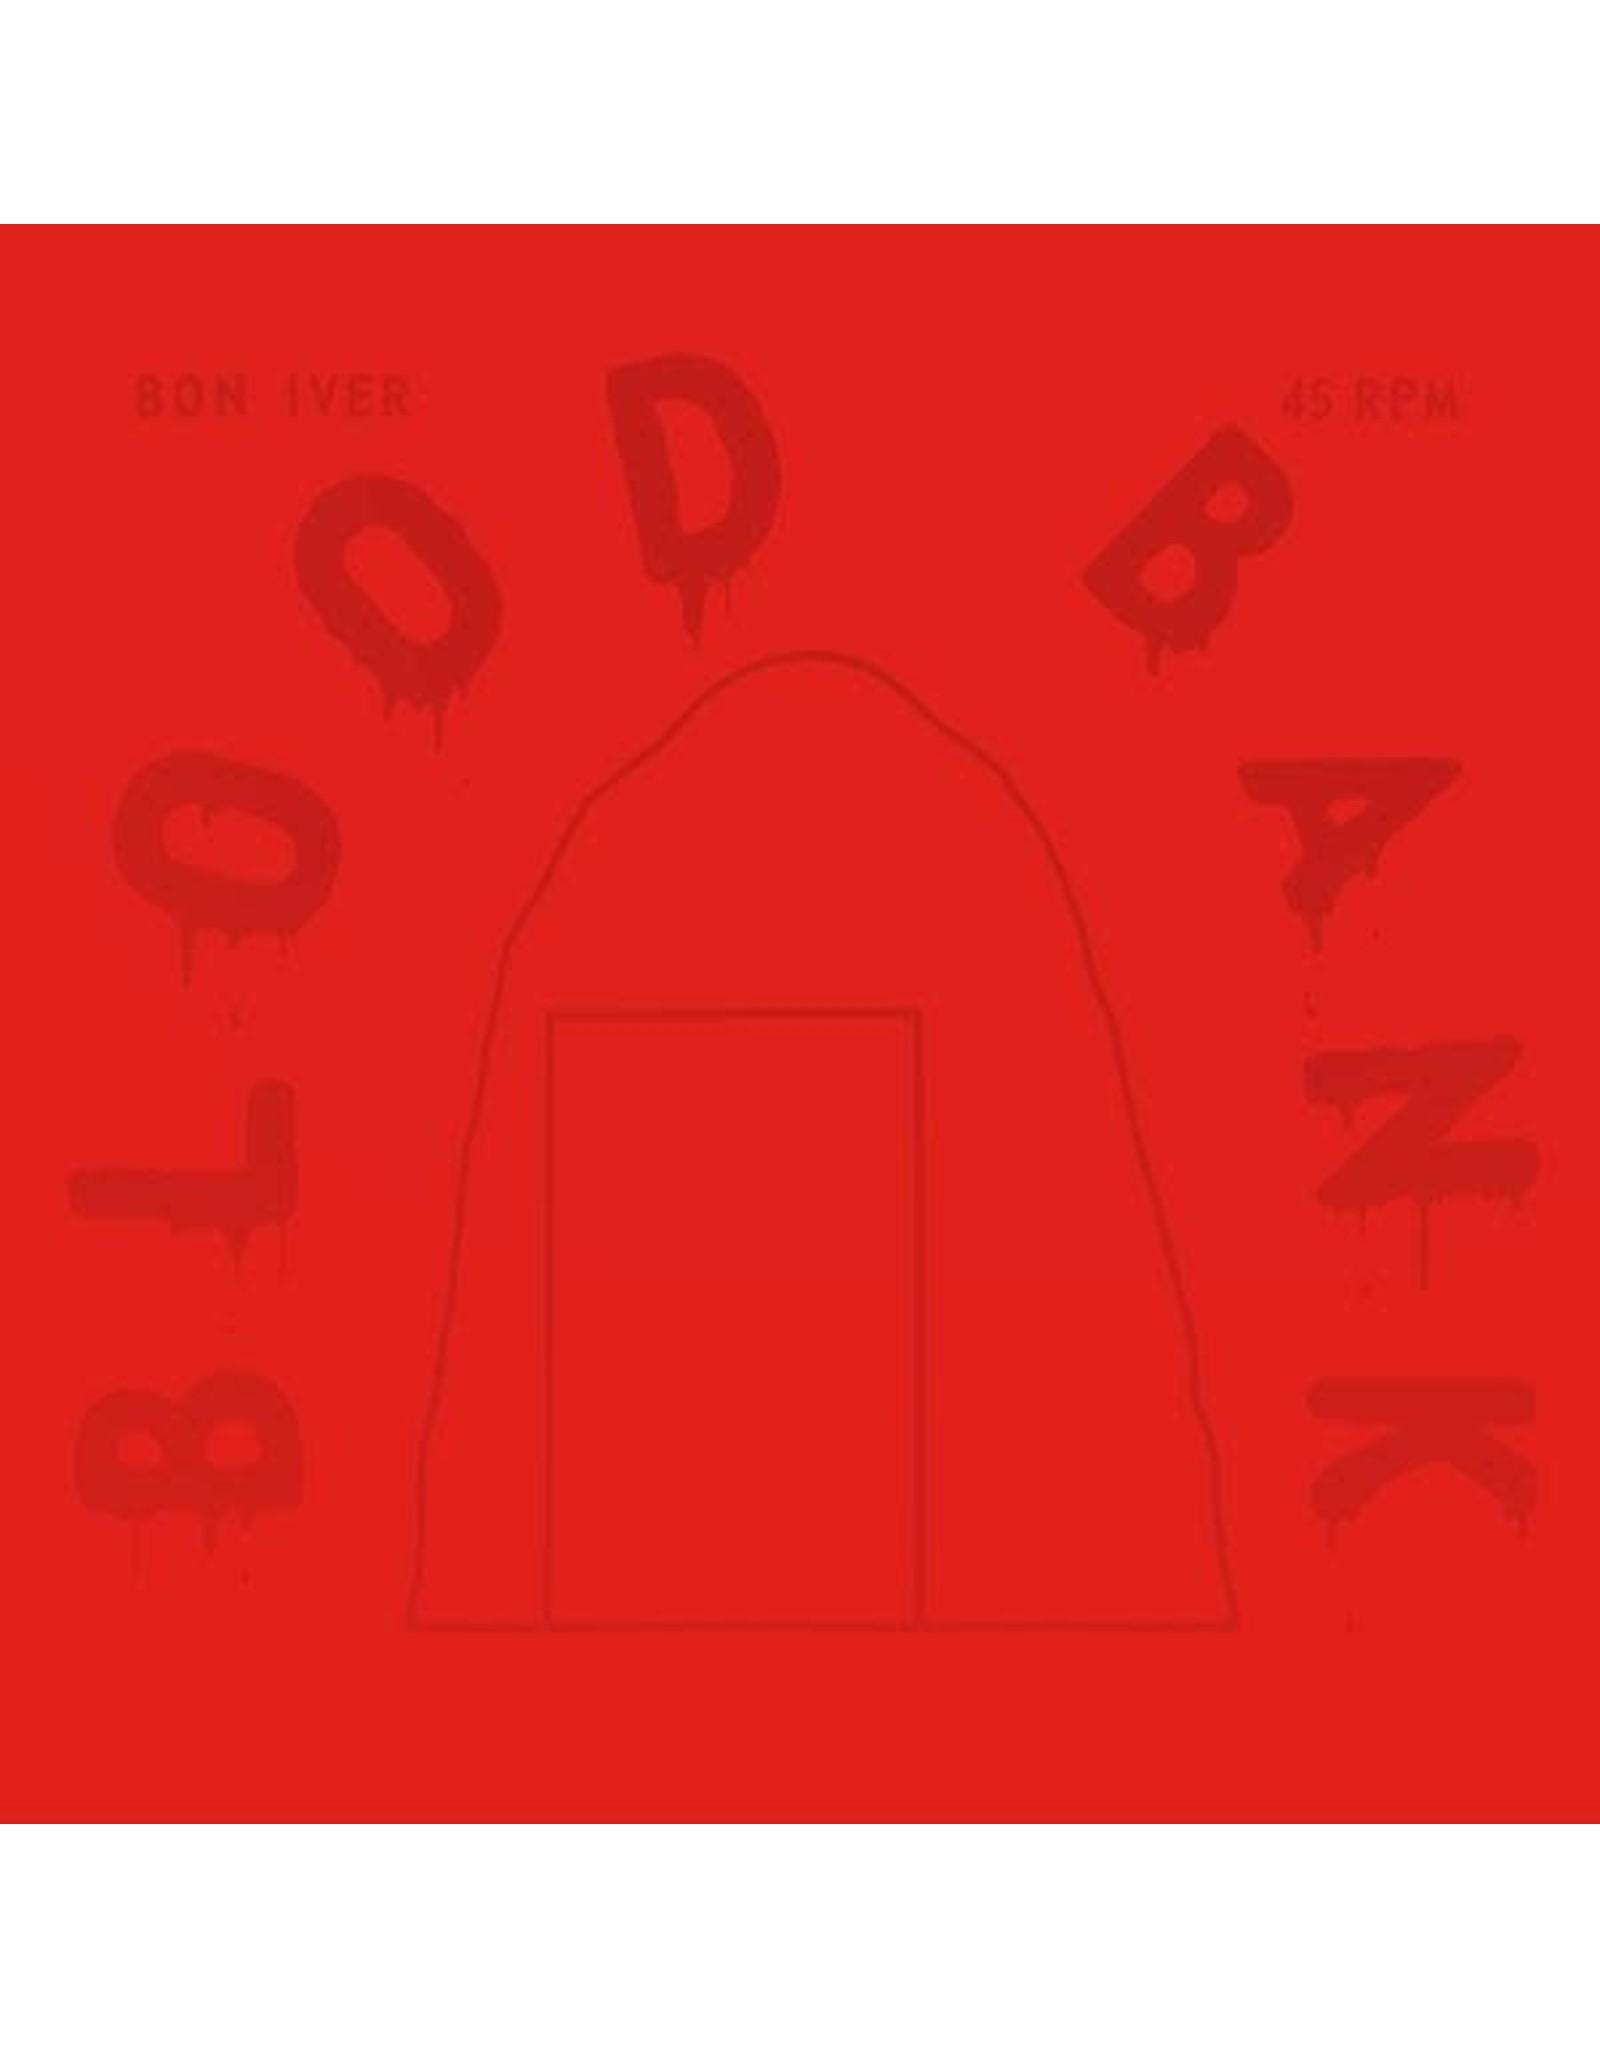 Bon Iver - Blood Bank EP (10th Anniversary Red Vinyl)